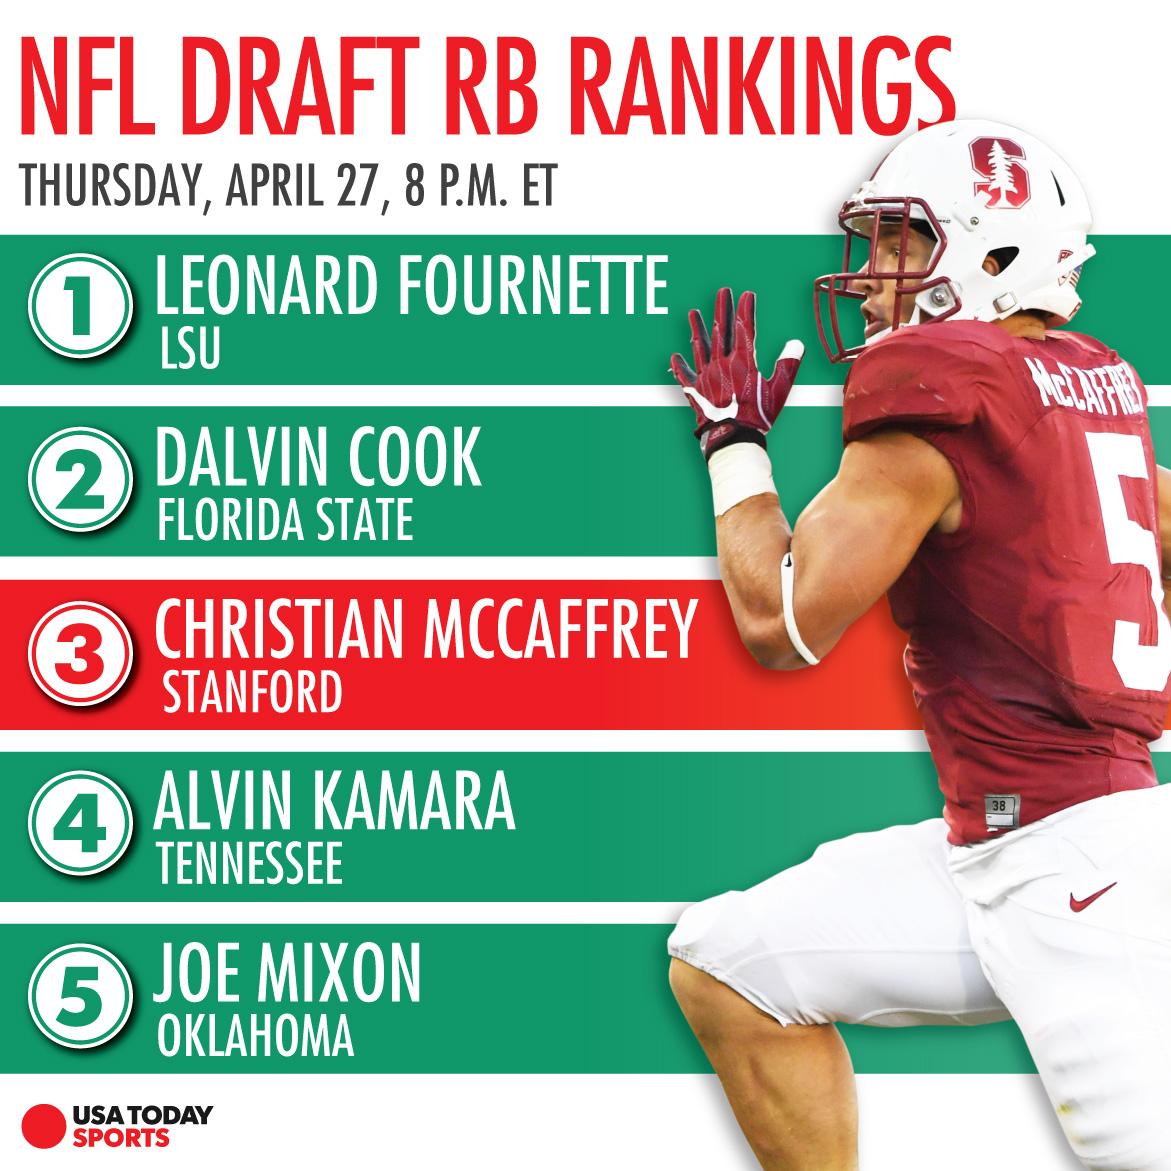 NFL draft social media graphic